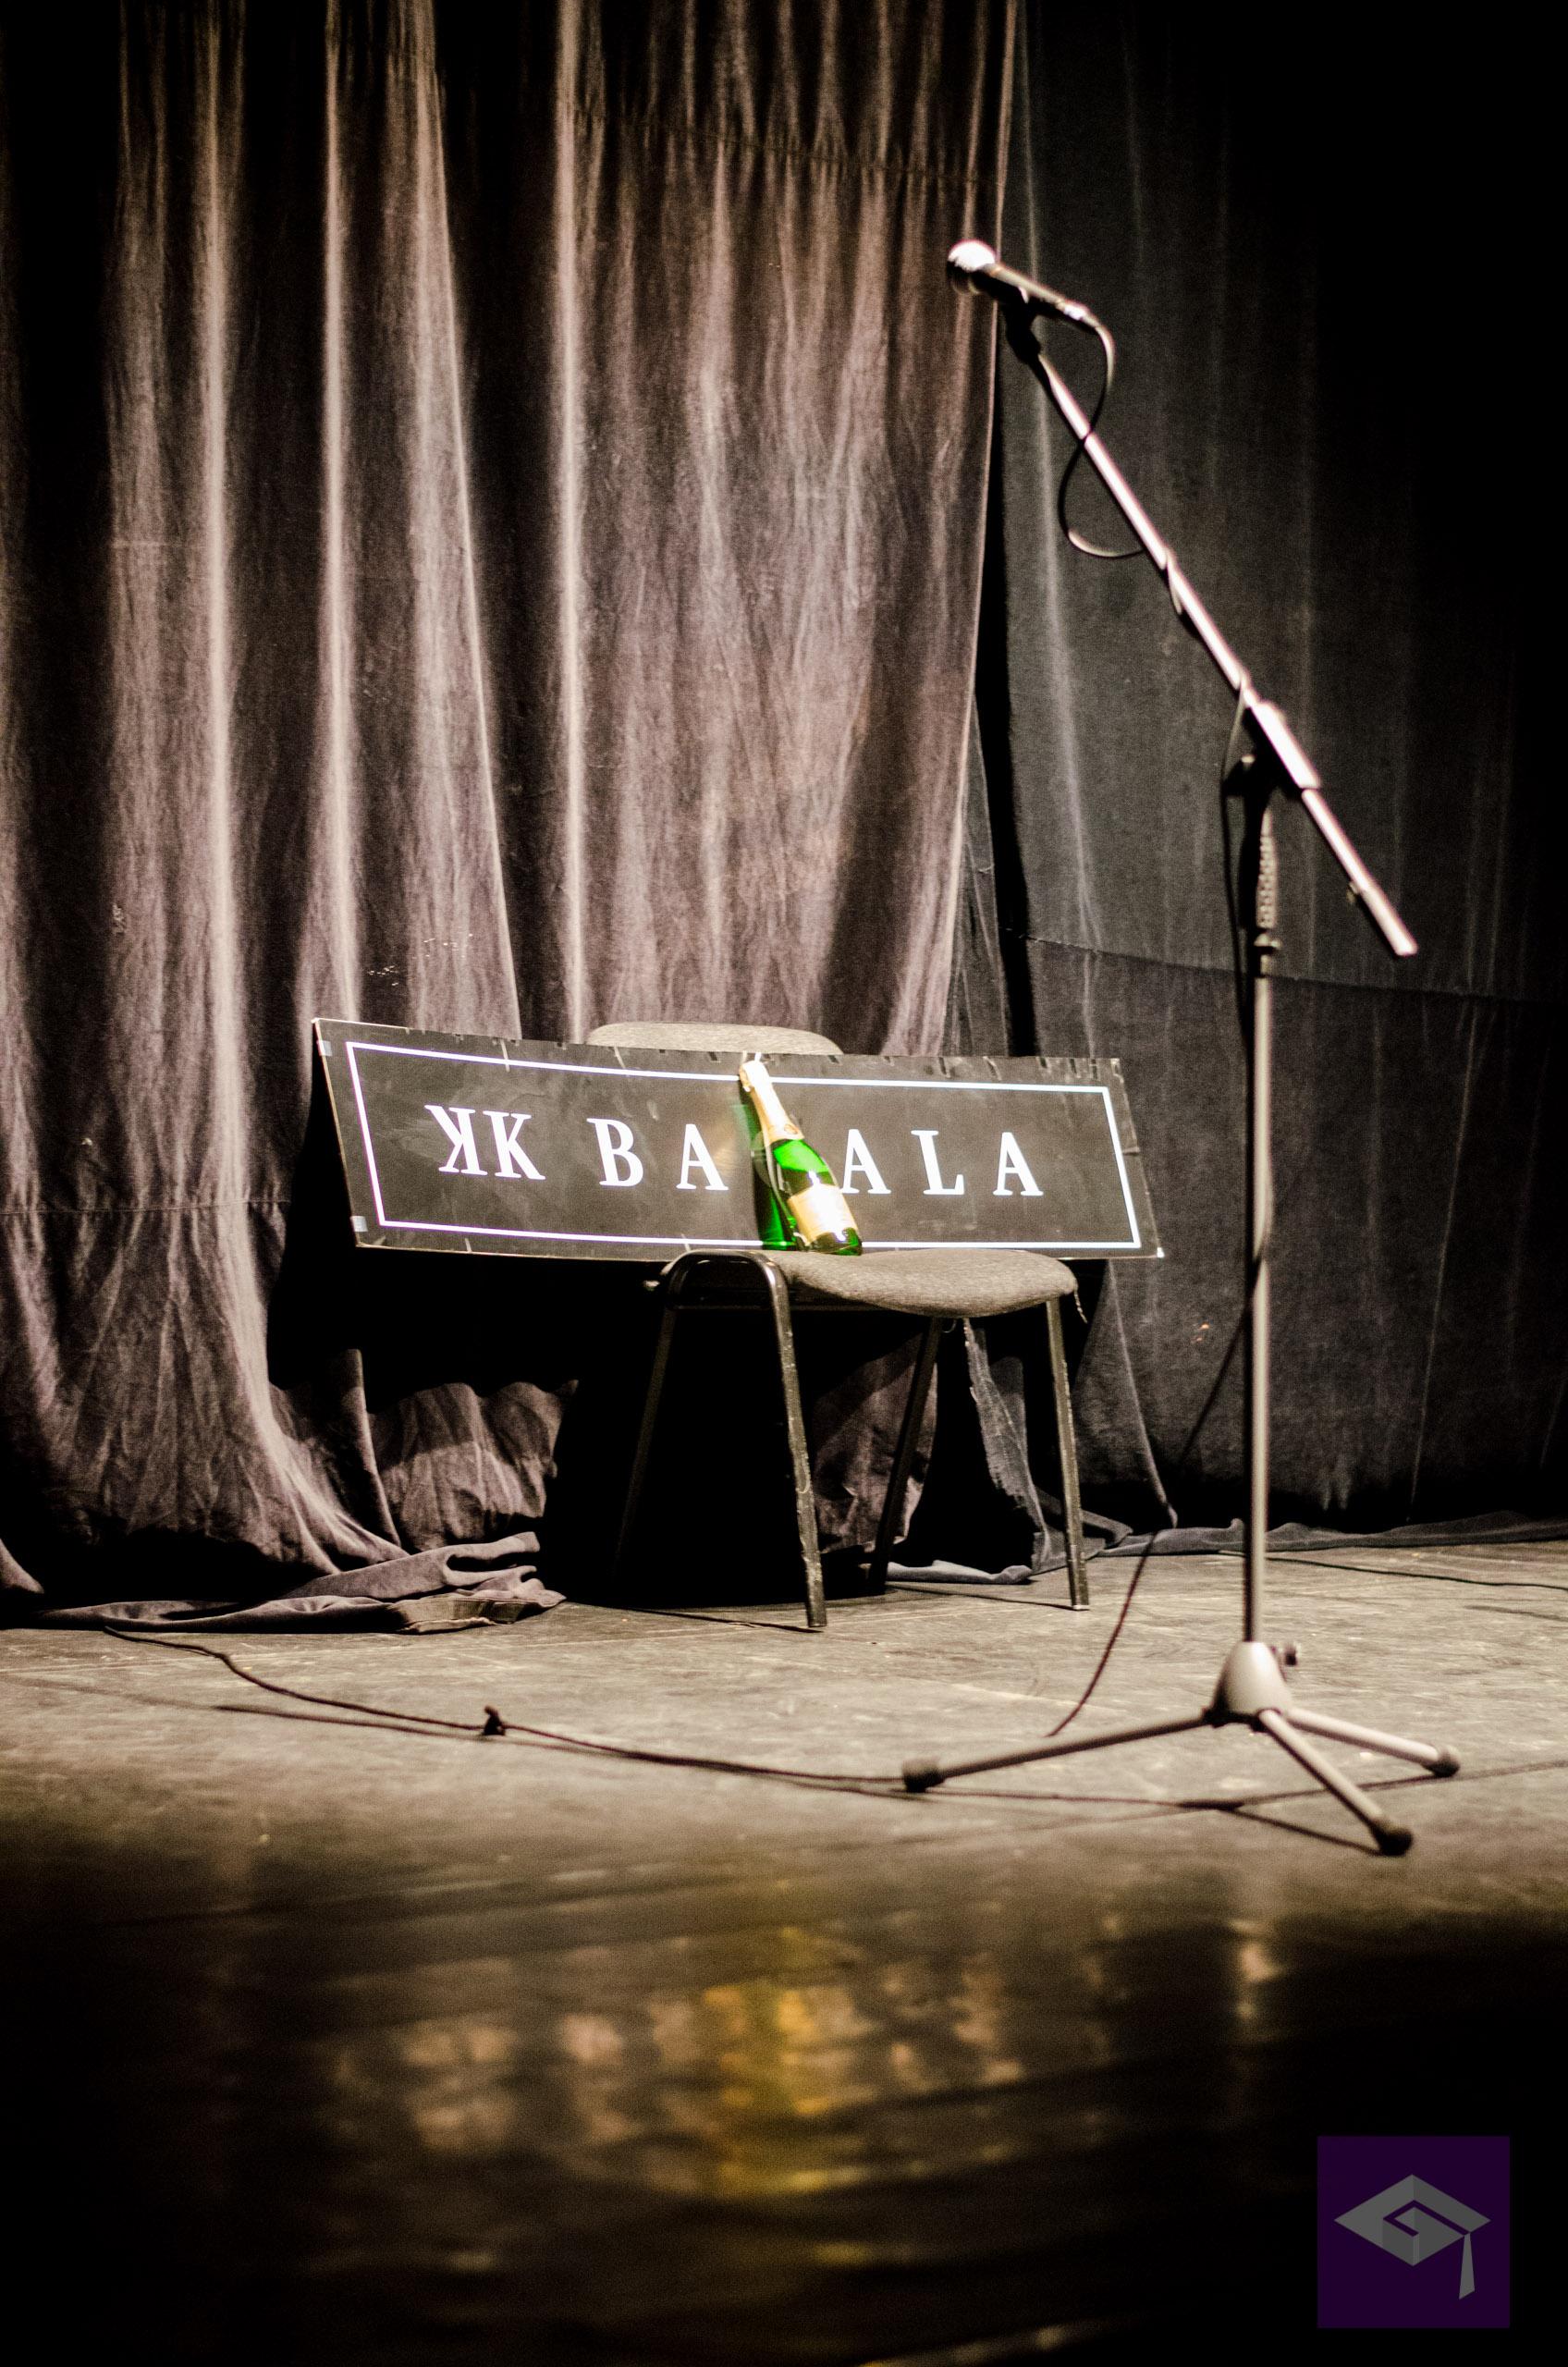 Vydavateľstvo KK Bagala: 25 rokov so slovami